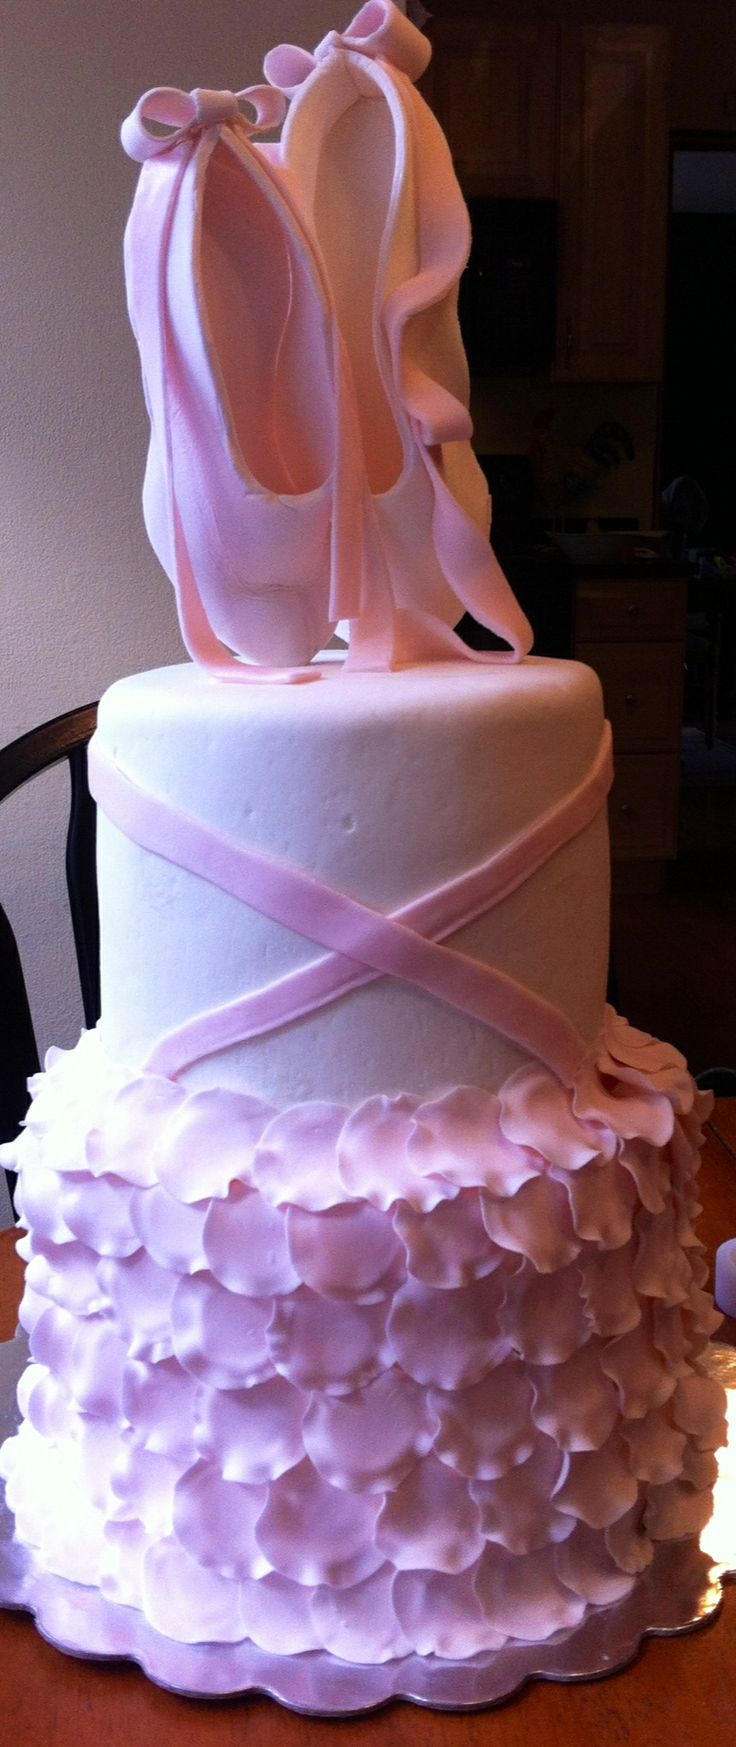 Party Cake Bakery Brookline